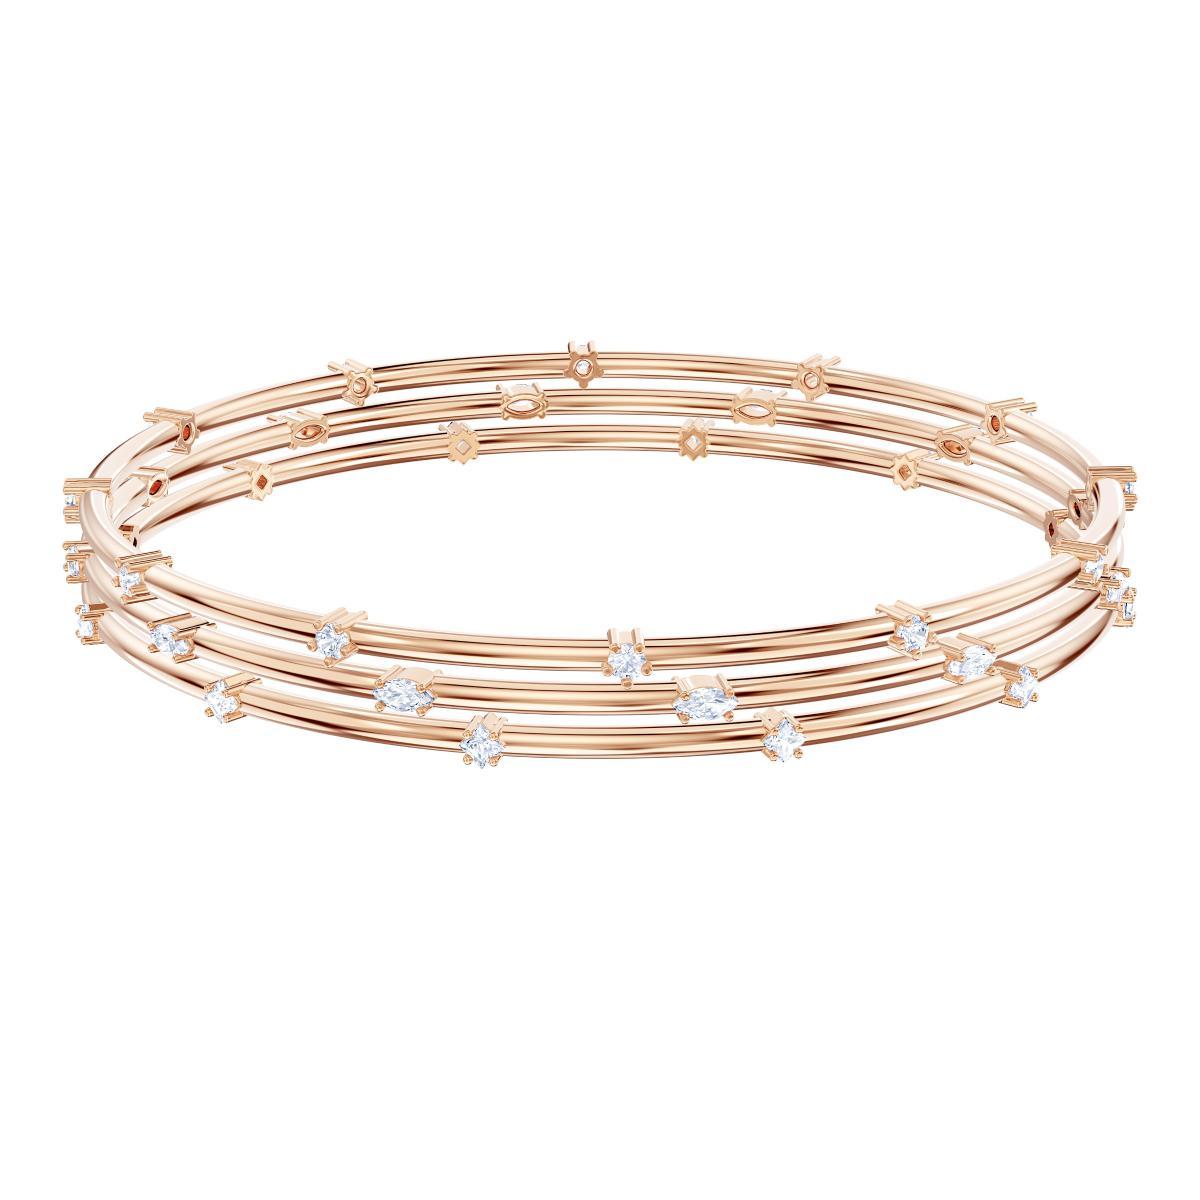 Bracelet Swarovski - Bracelet Doré Rose Cristaux Femme